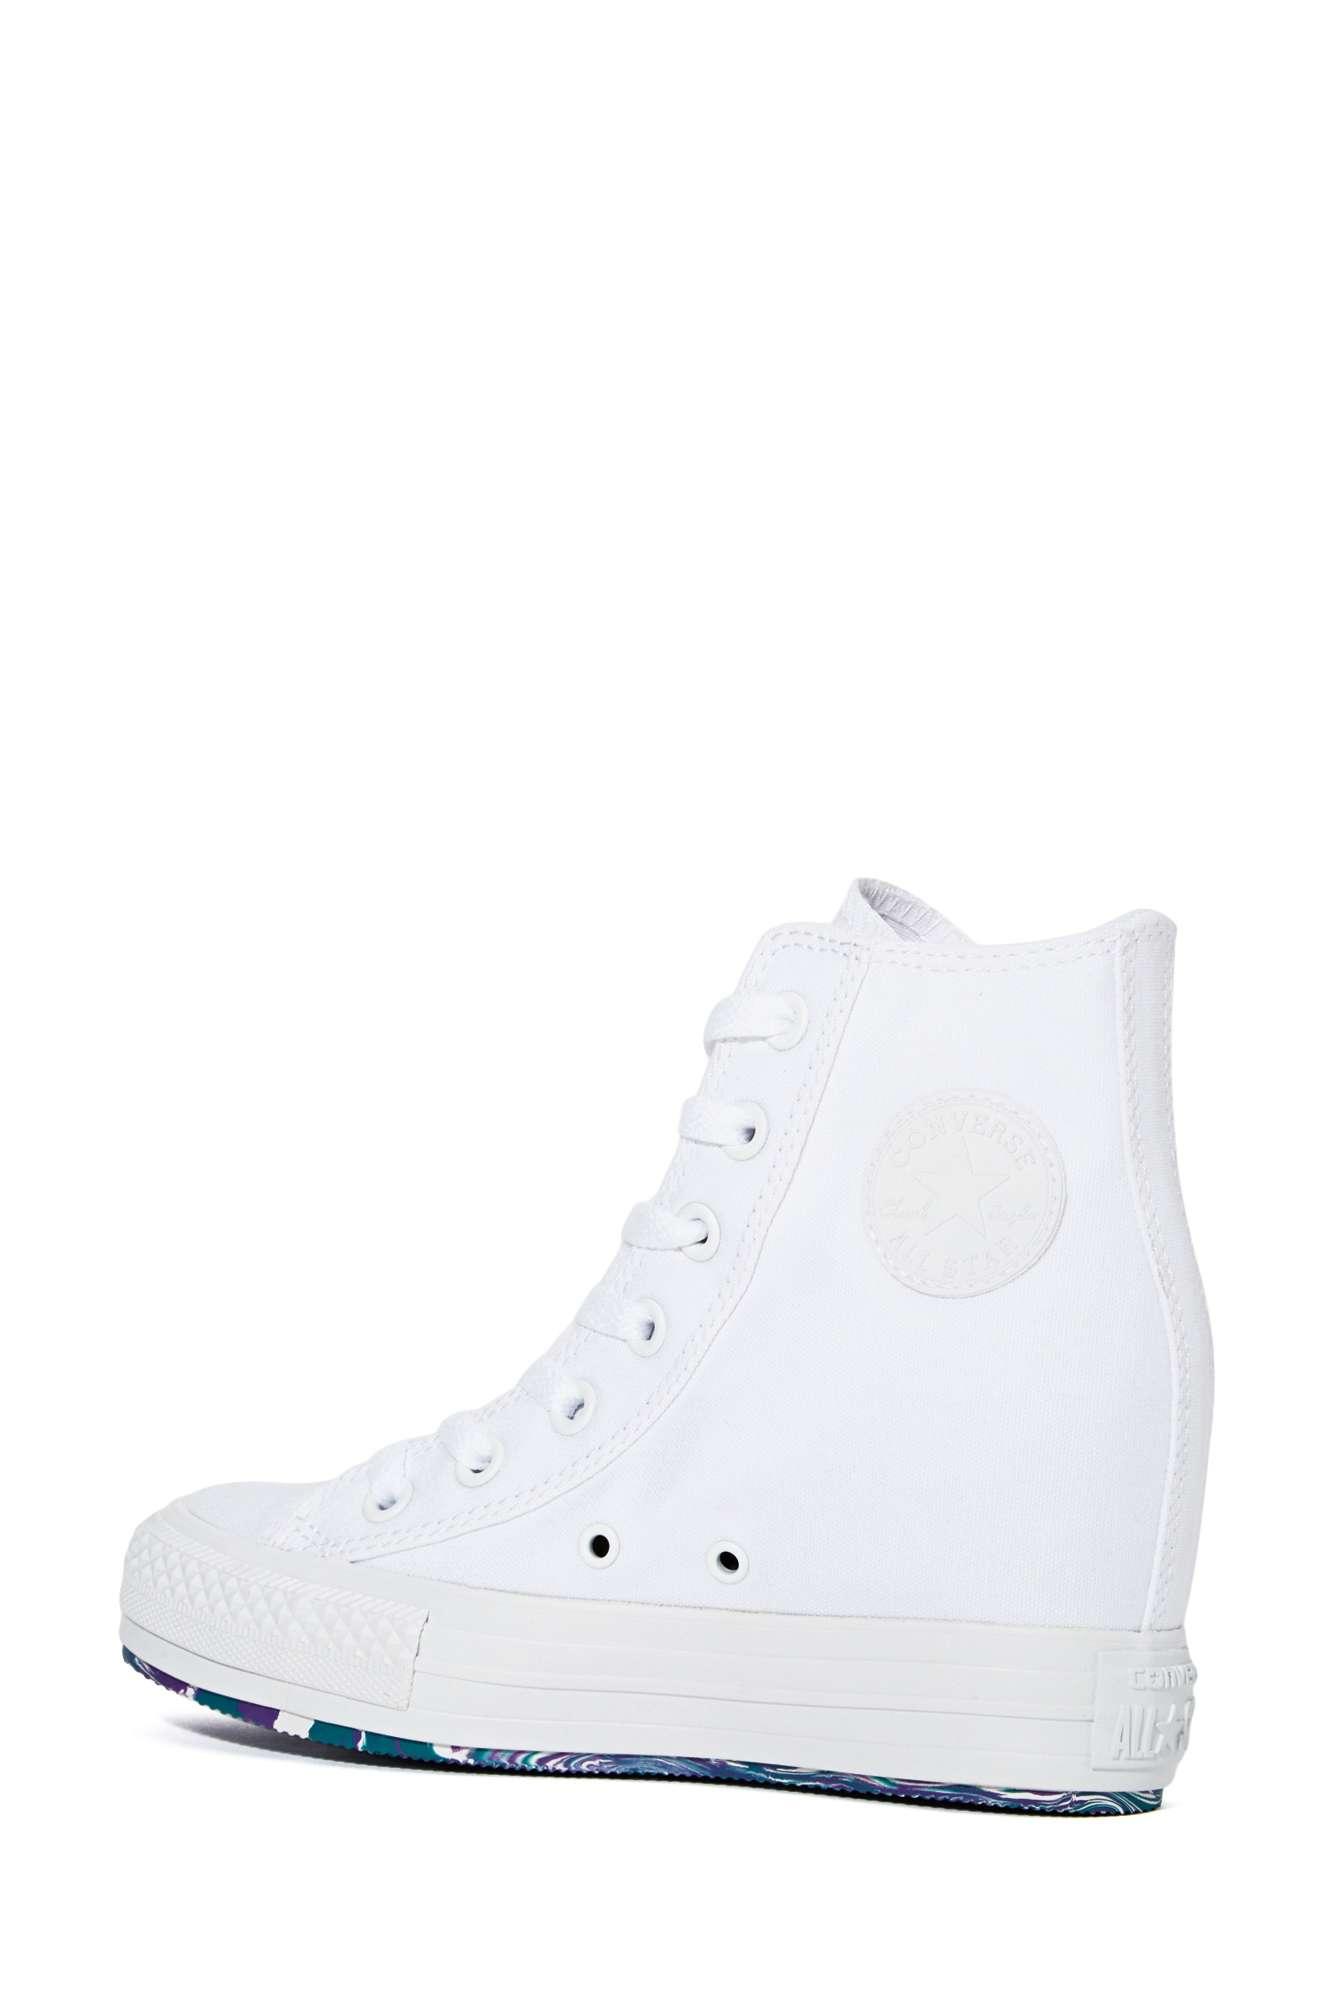 Star Sneaker Gal Nasty White All Lyst High Platform Converse Top IAUq1w 214e07e02